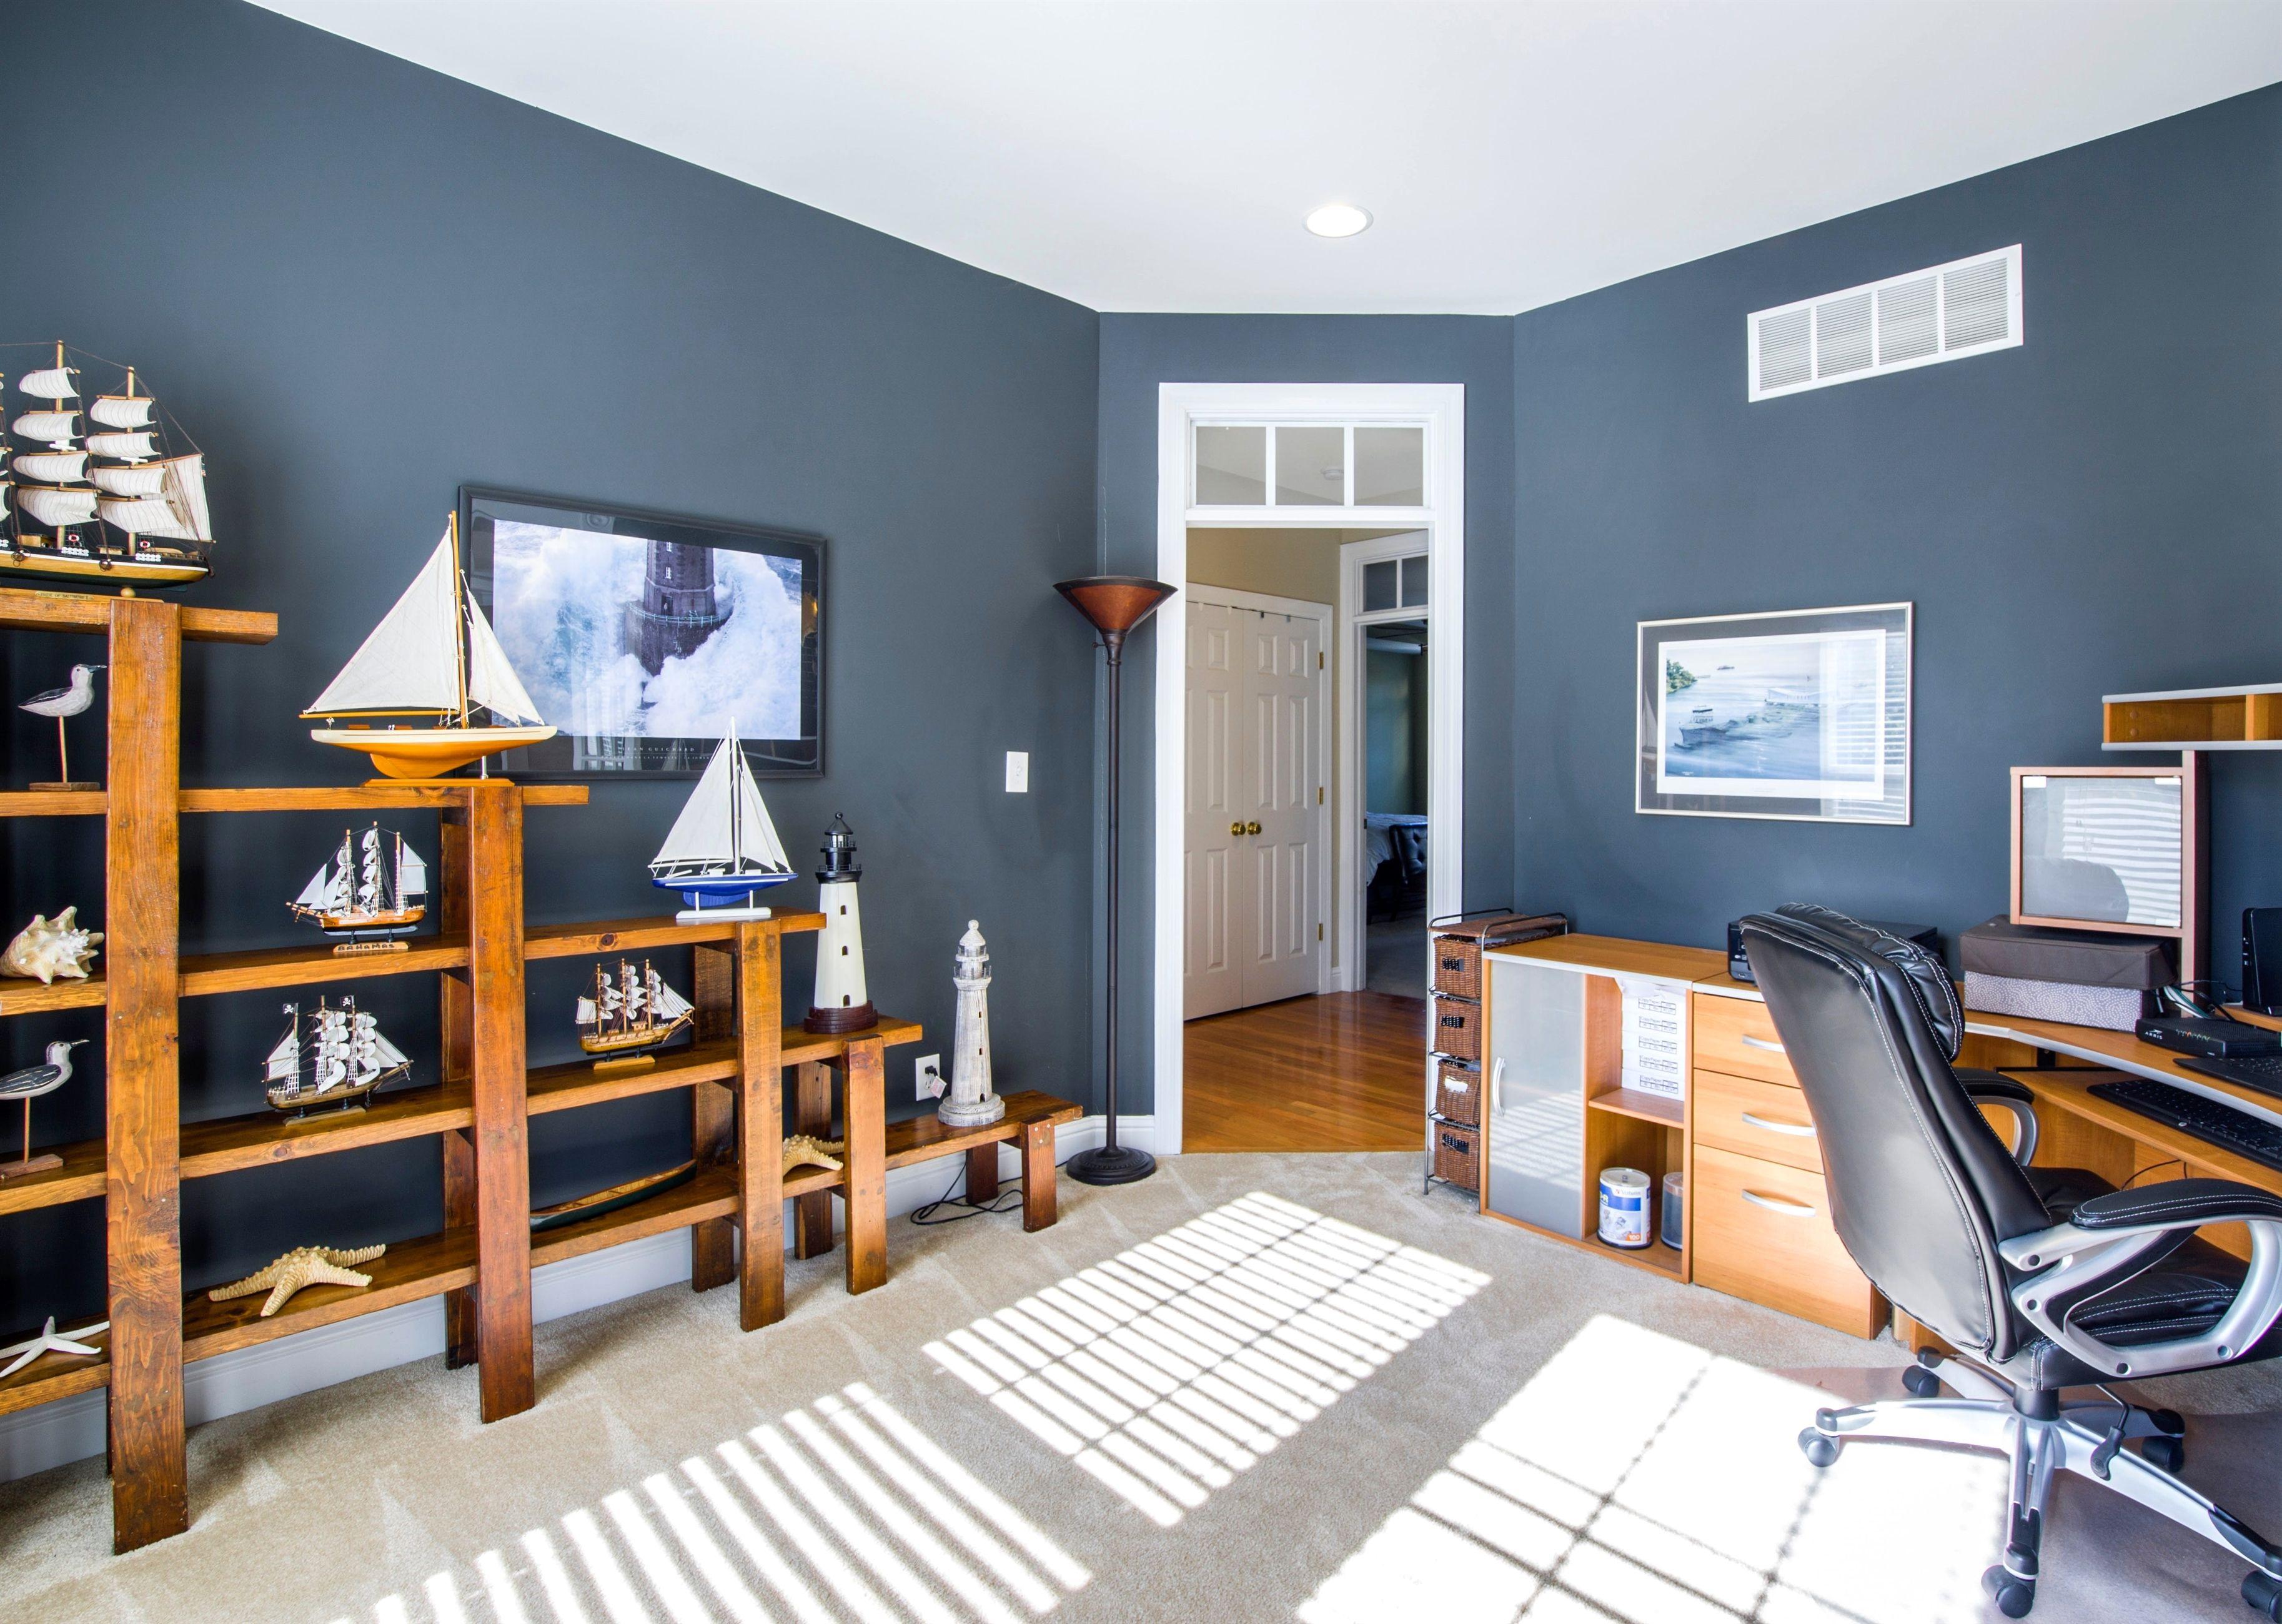 32 Rustic Home Decor ideas   home improvement projects, decor ...